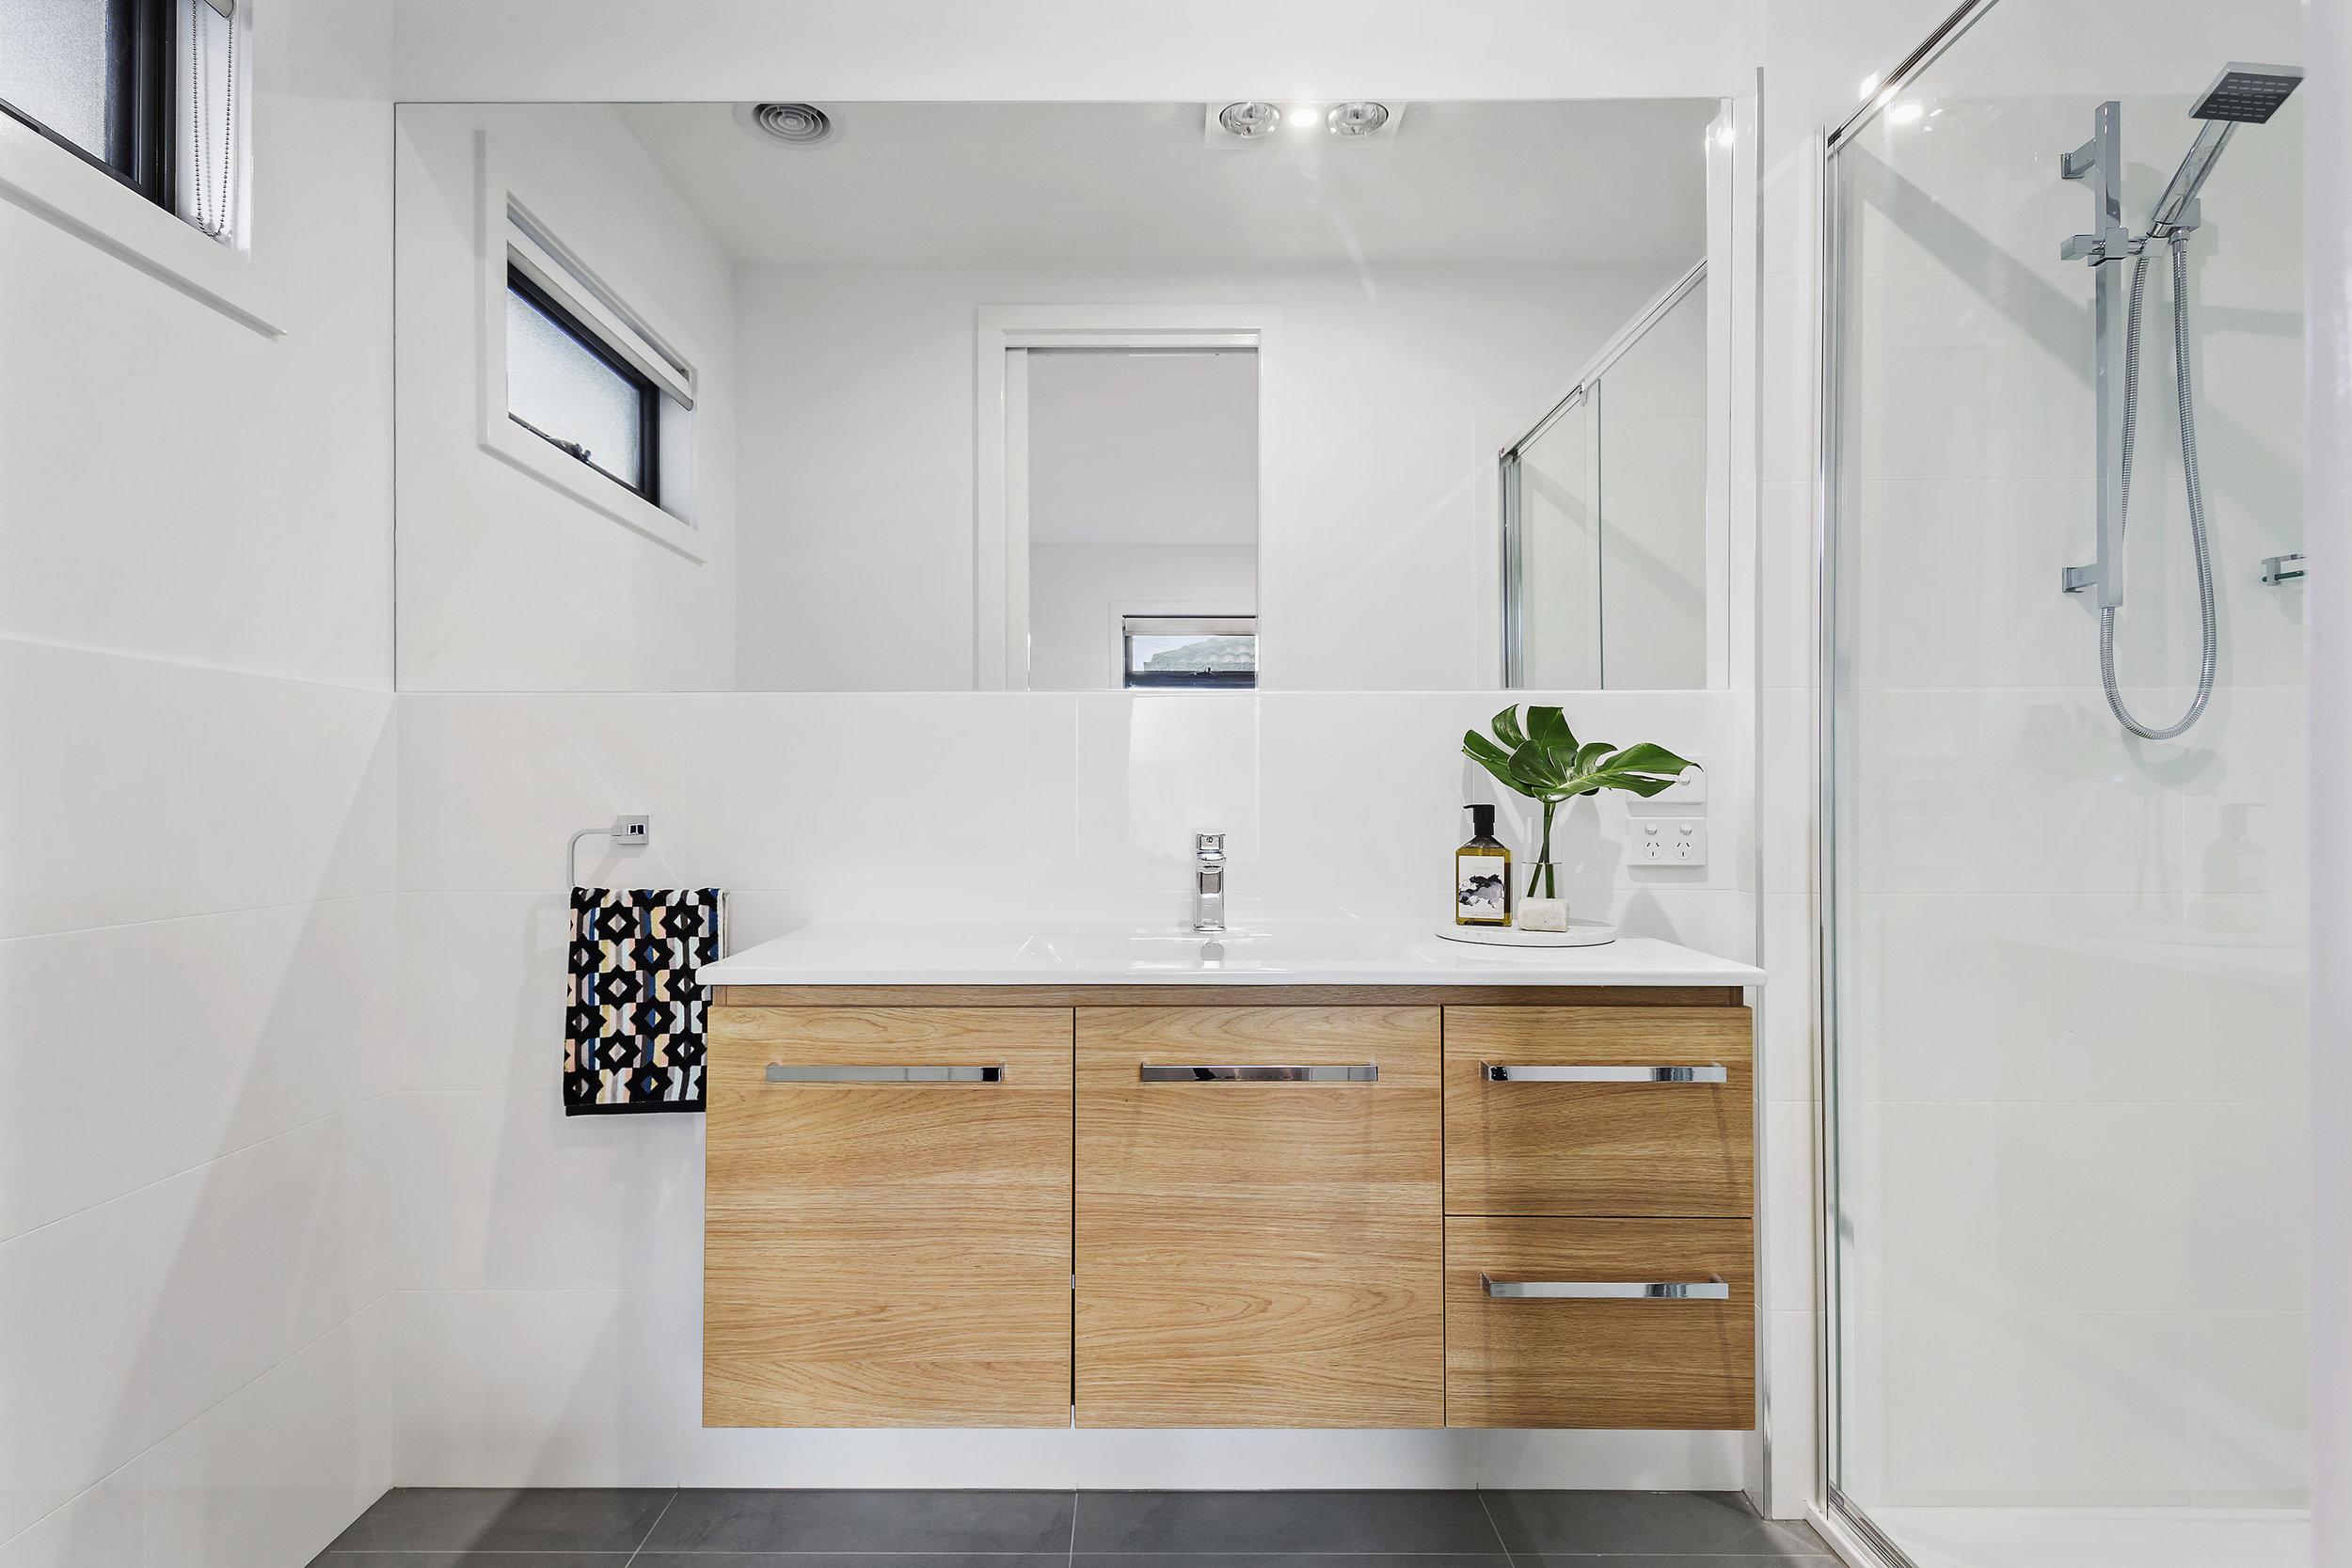 Maidstone Altona Yarraville Williamstown Creative Property Styling Melbourne (7).jpg